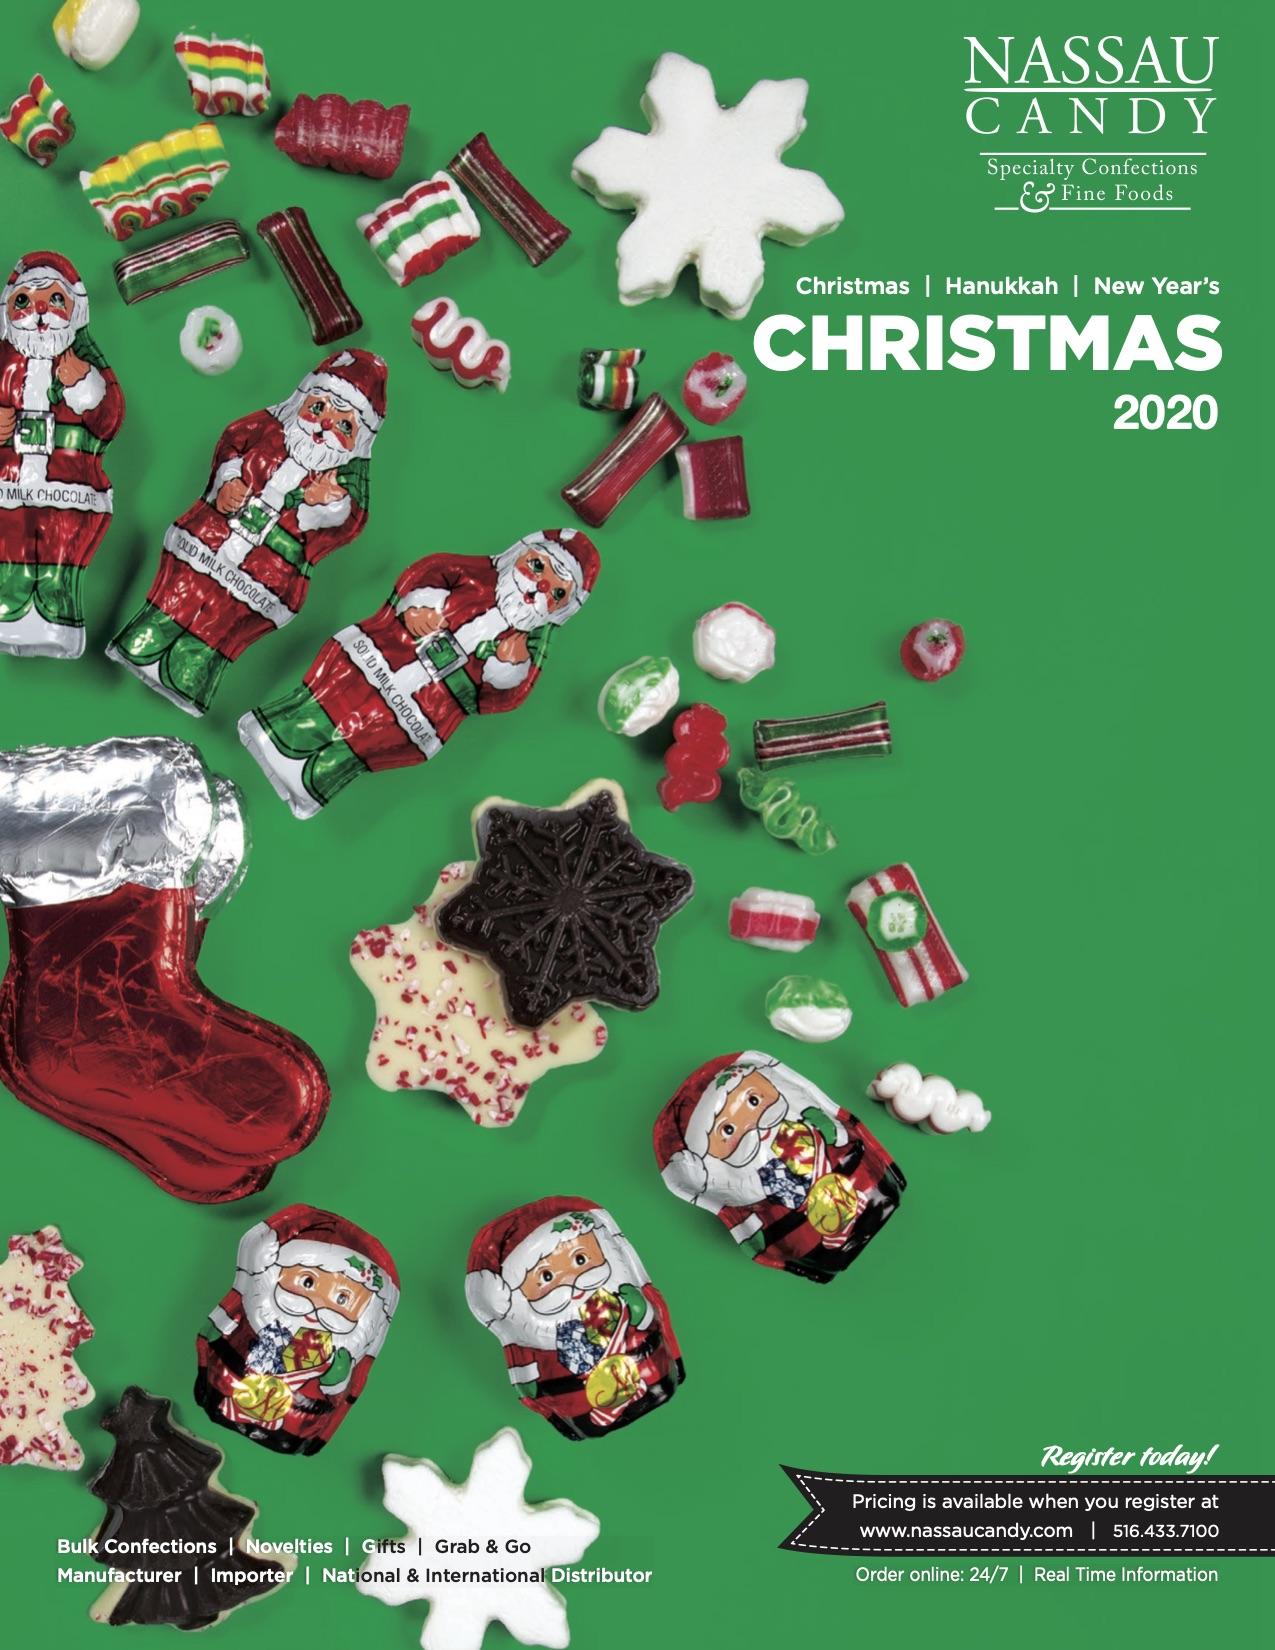 Nassau Candy Holiday Catalog